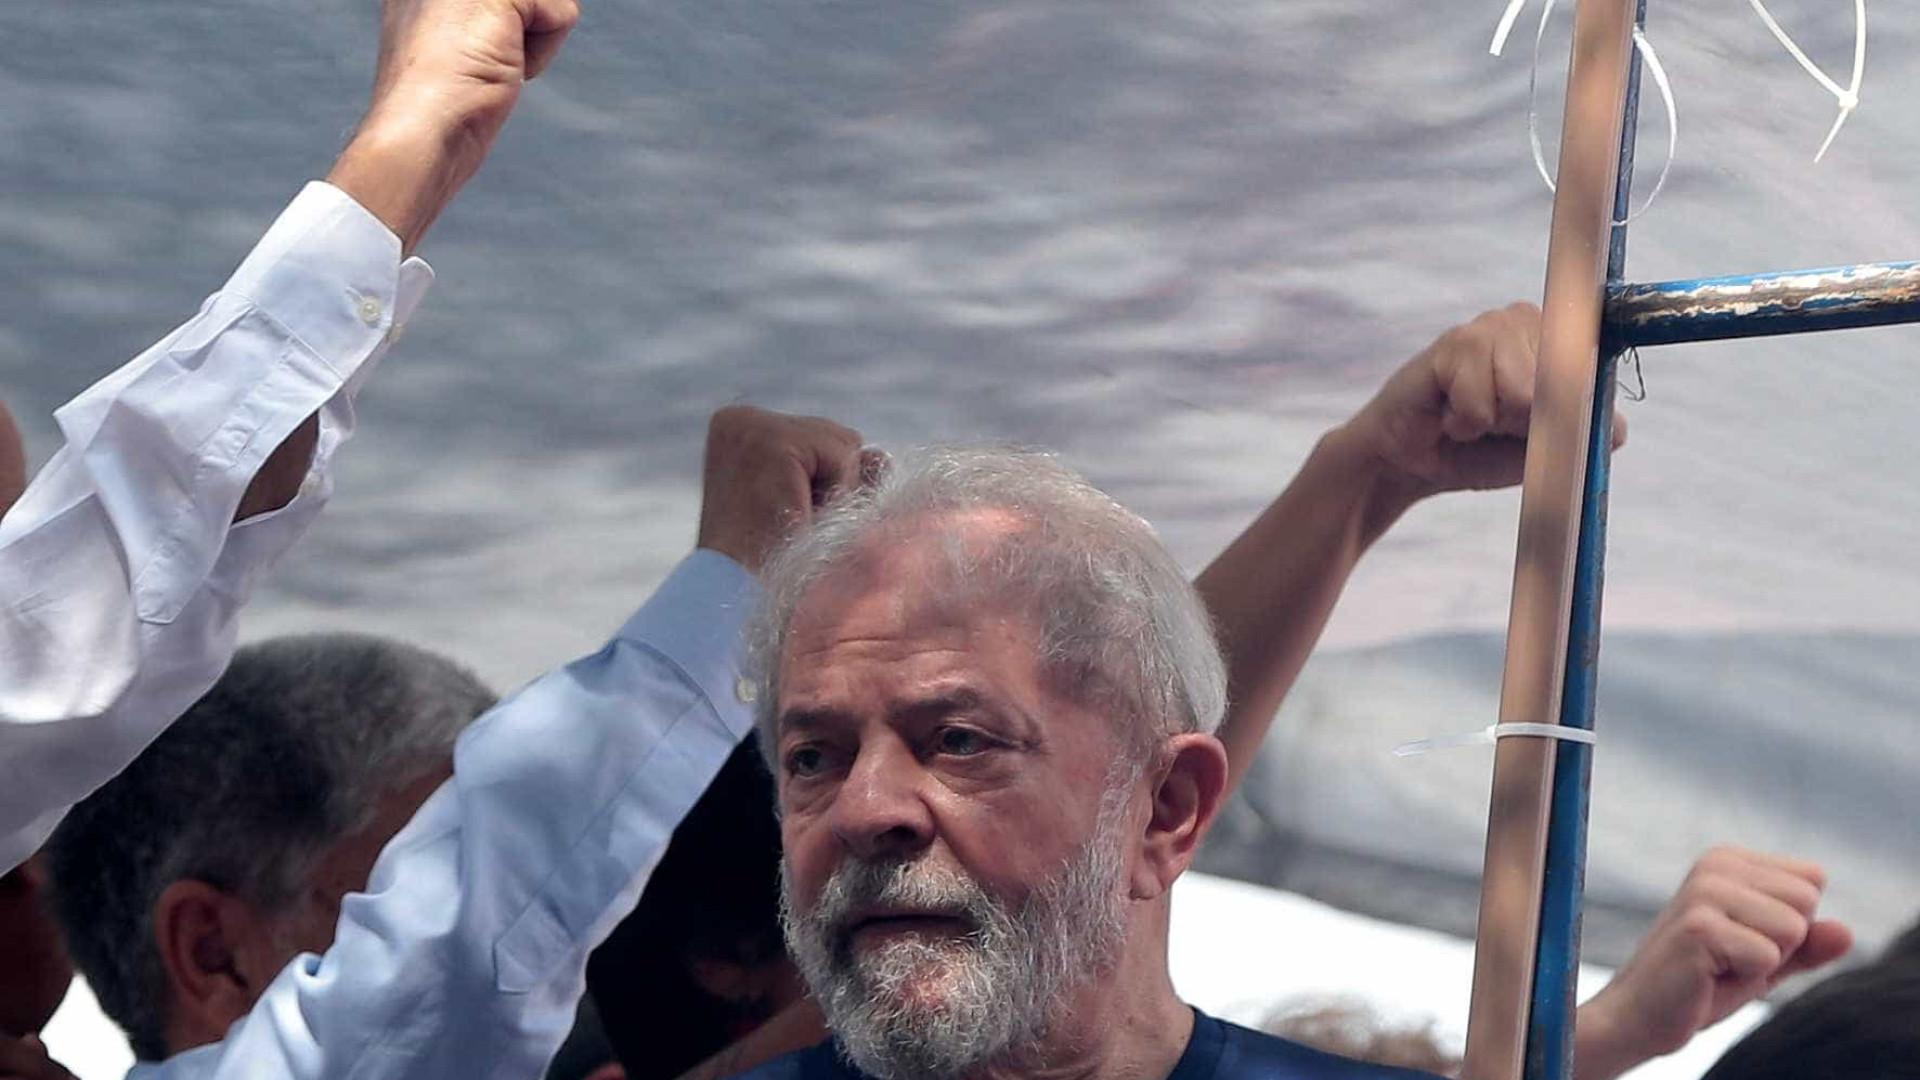 Aparência de Lula comove juízes, que discutem prisão domiciliar